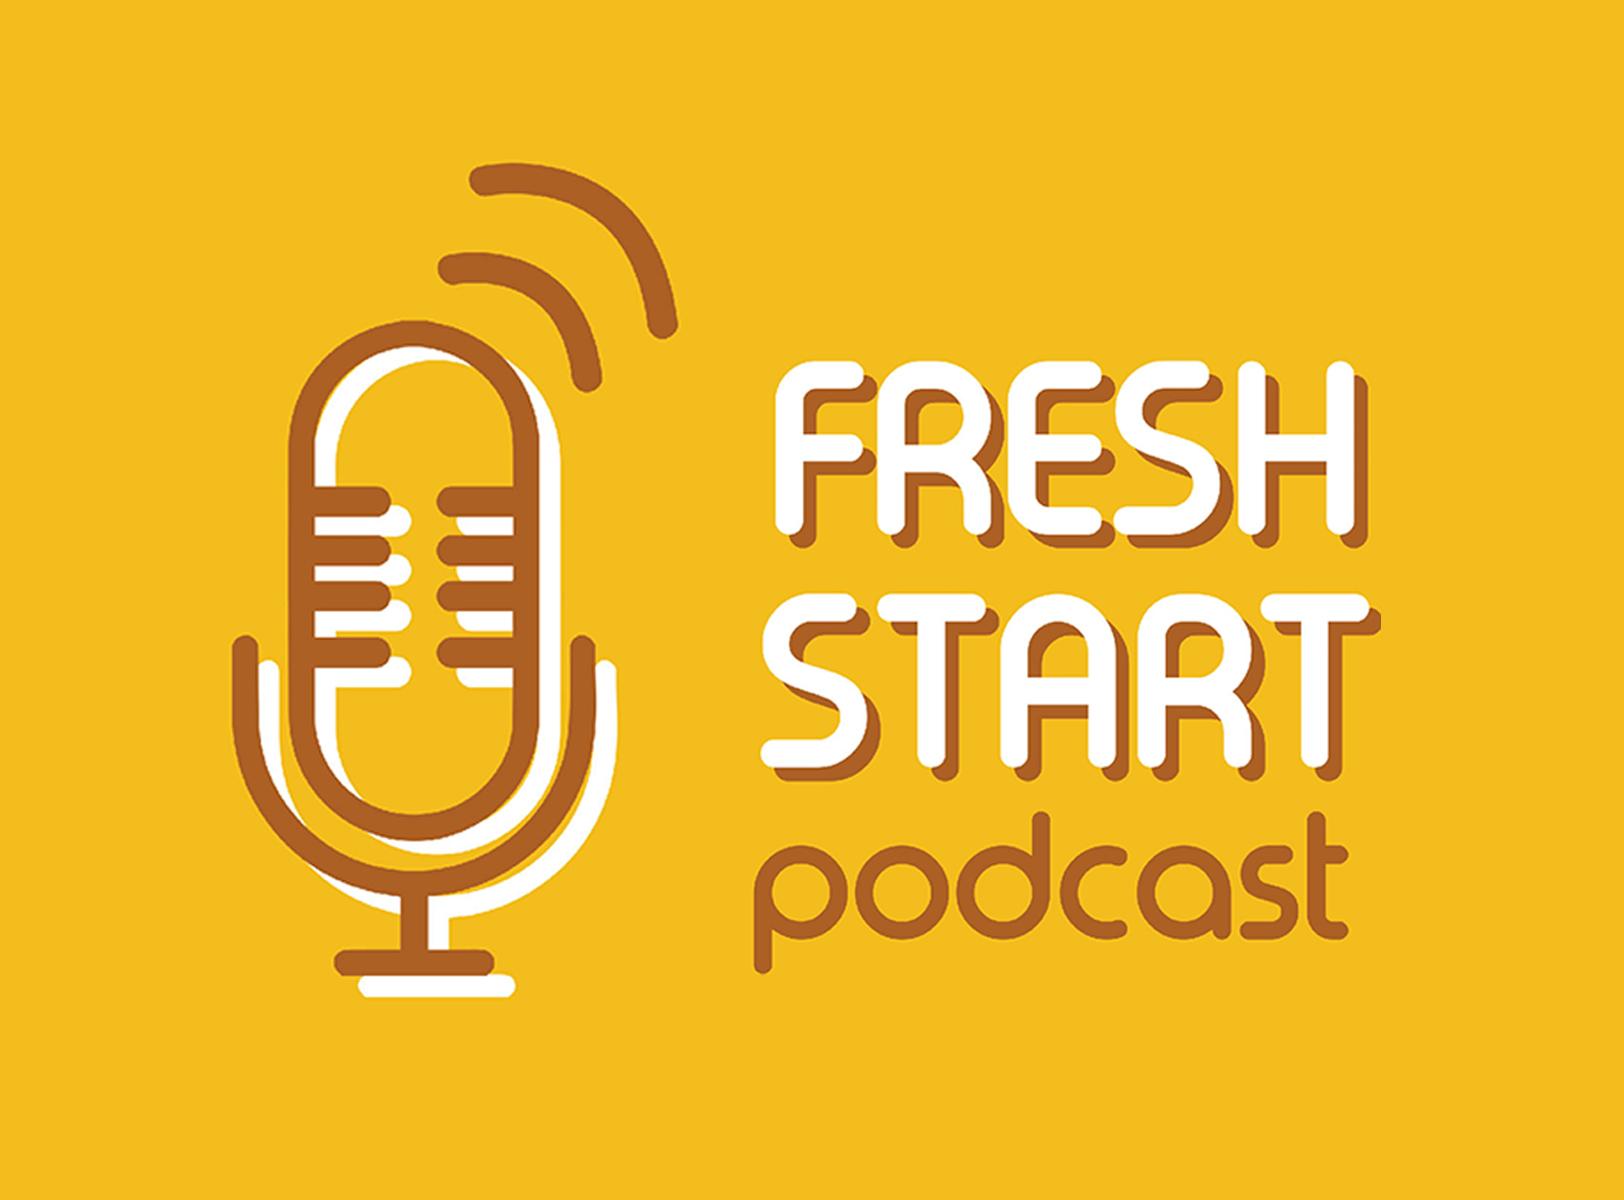 Fresh Start: Podcast News (1/30/2020 Thu.)